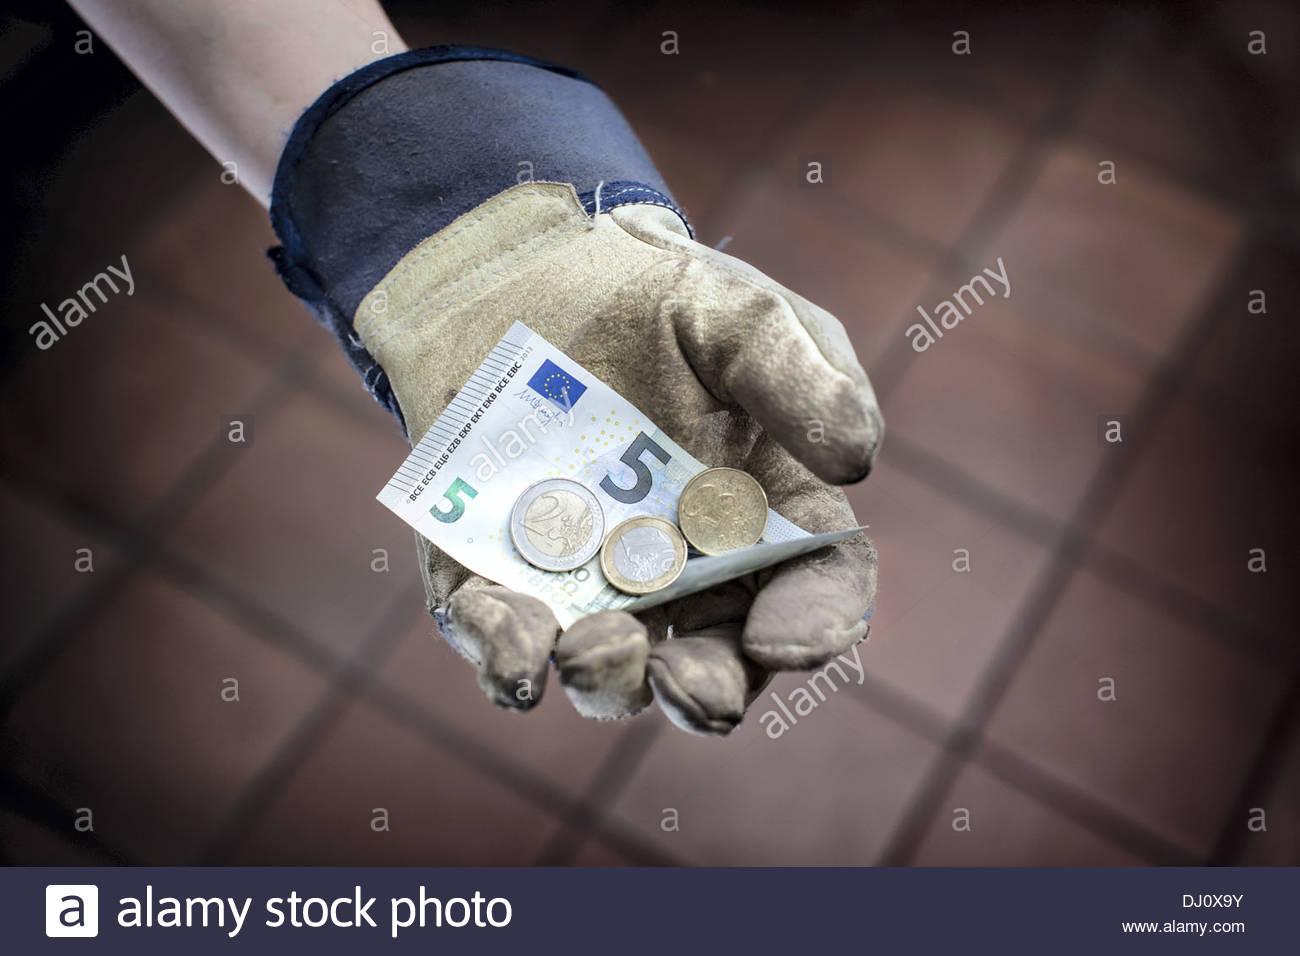 symbol minimum wage low wages stock photo royalty image stock photo symbol minimum wage low wages